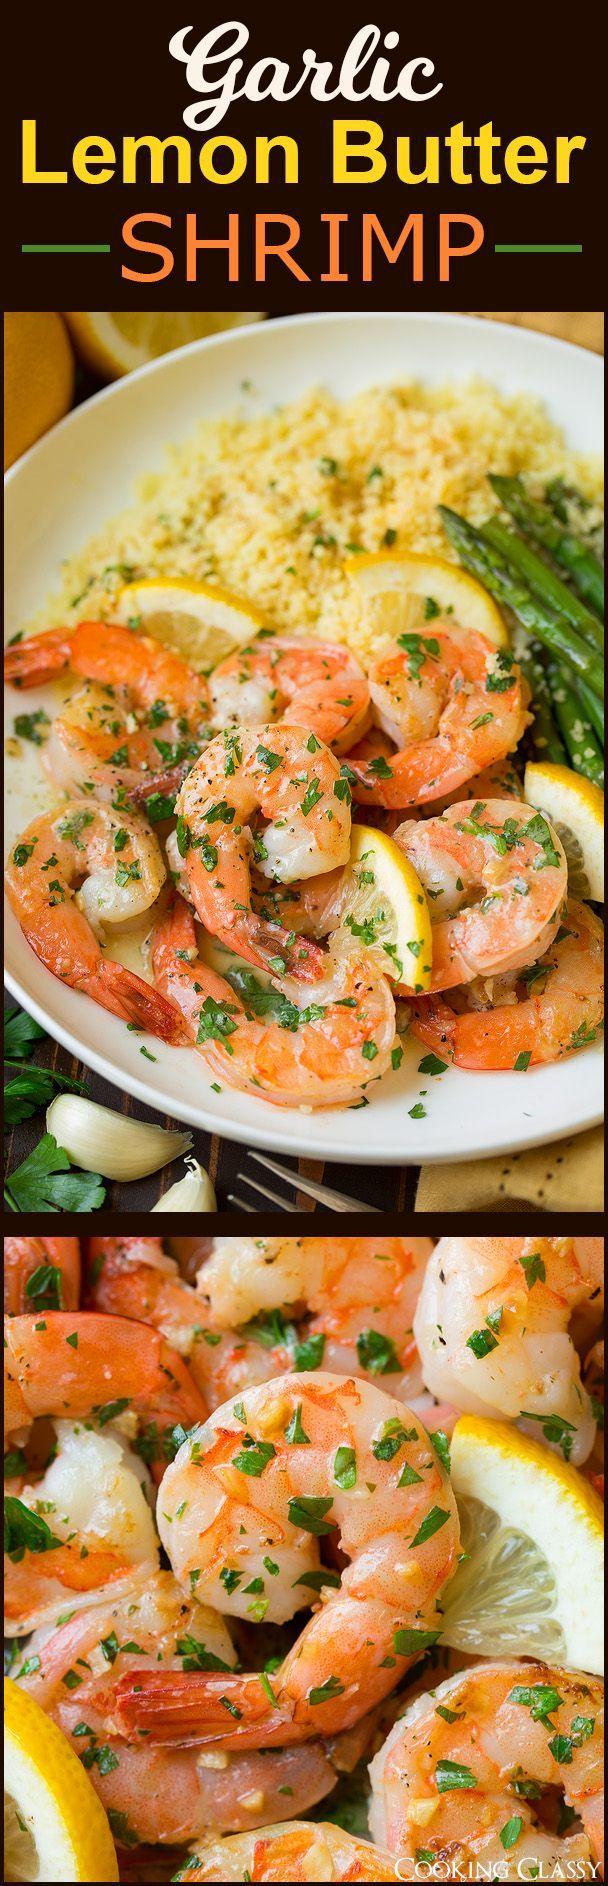 Garlic Lemon Butter Shrimp - seriously easy and so good!